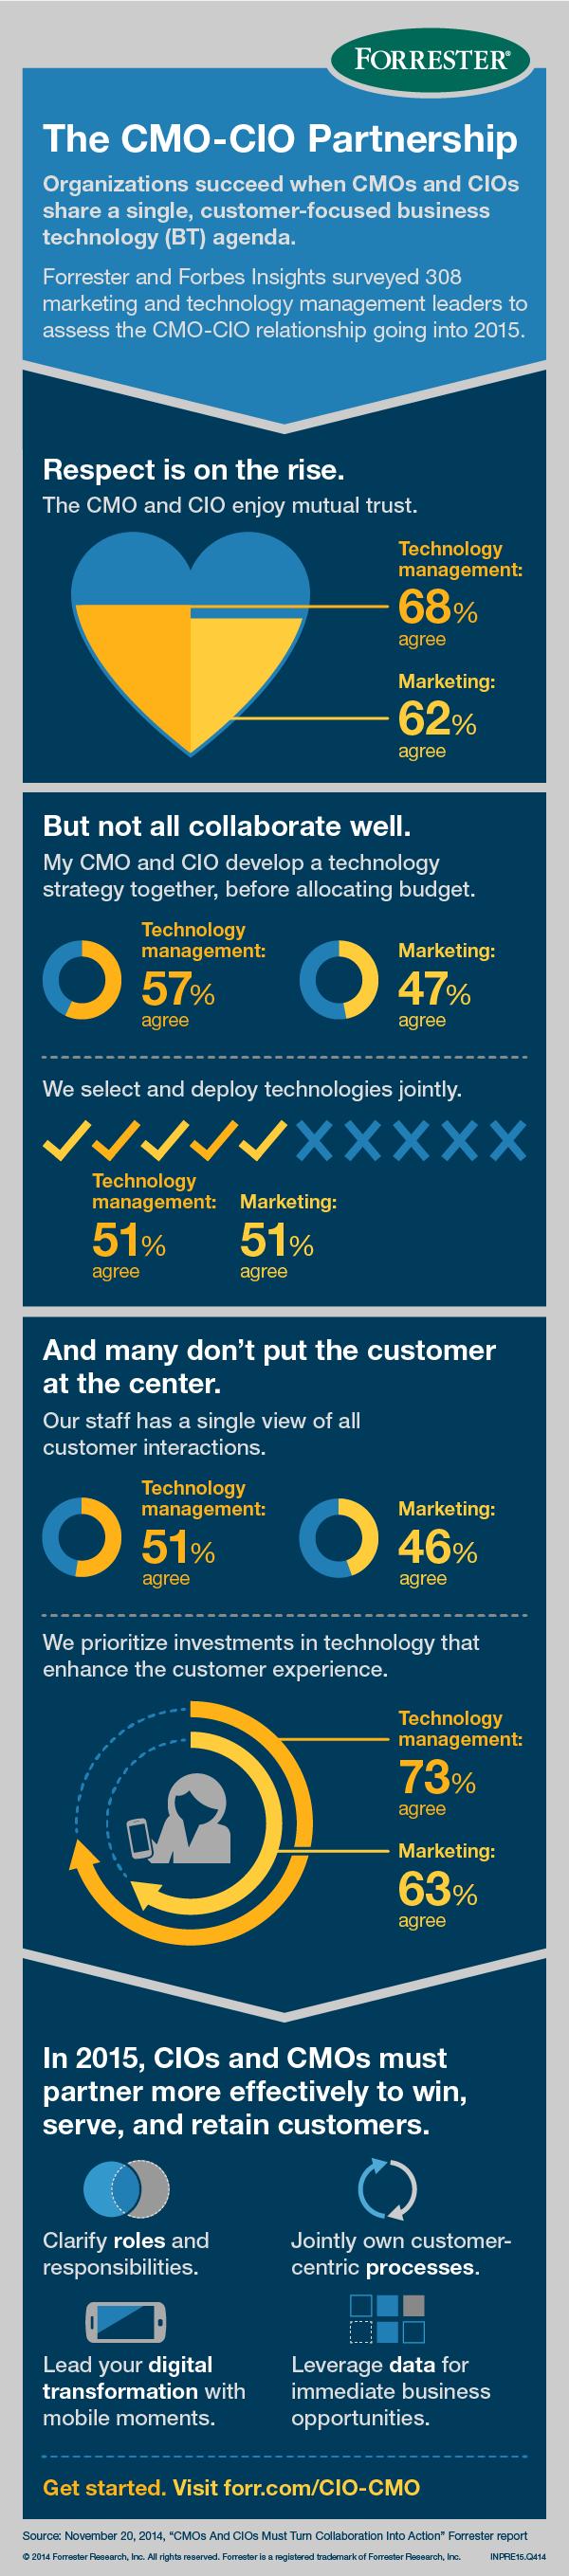 CMO-CIO Partnership 2015 infographic